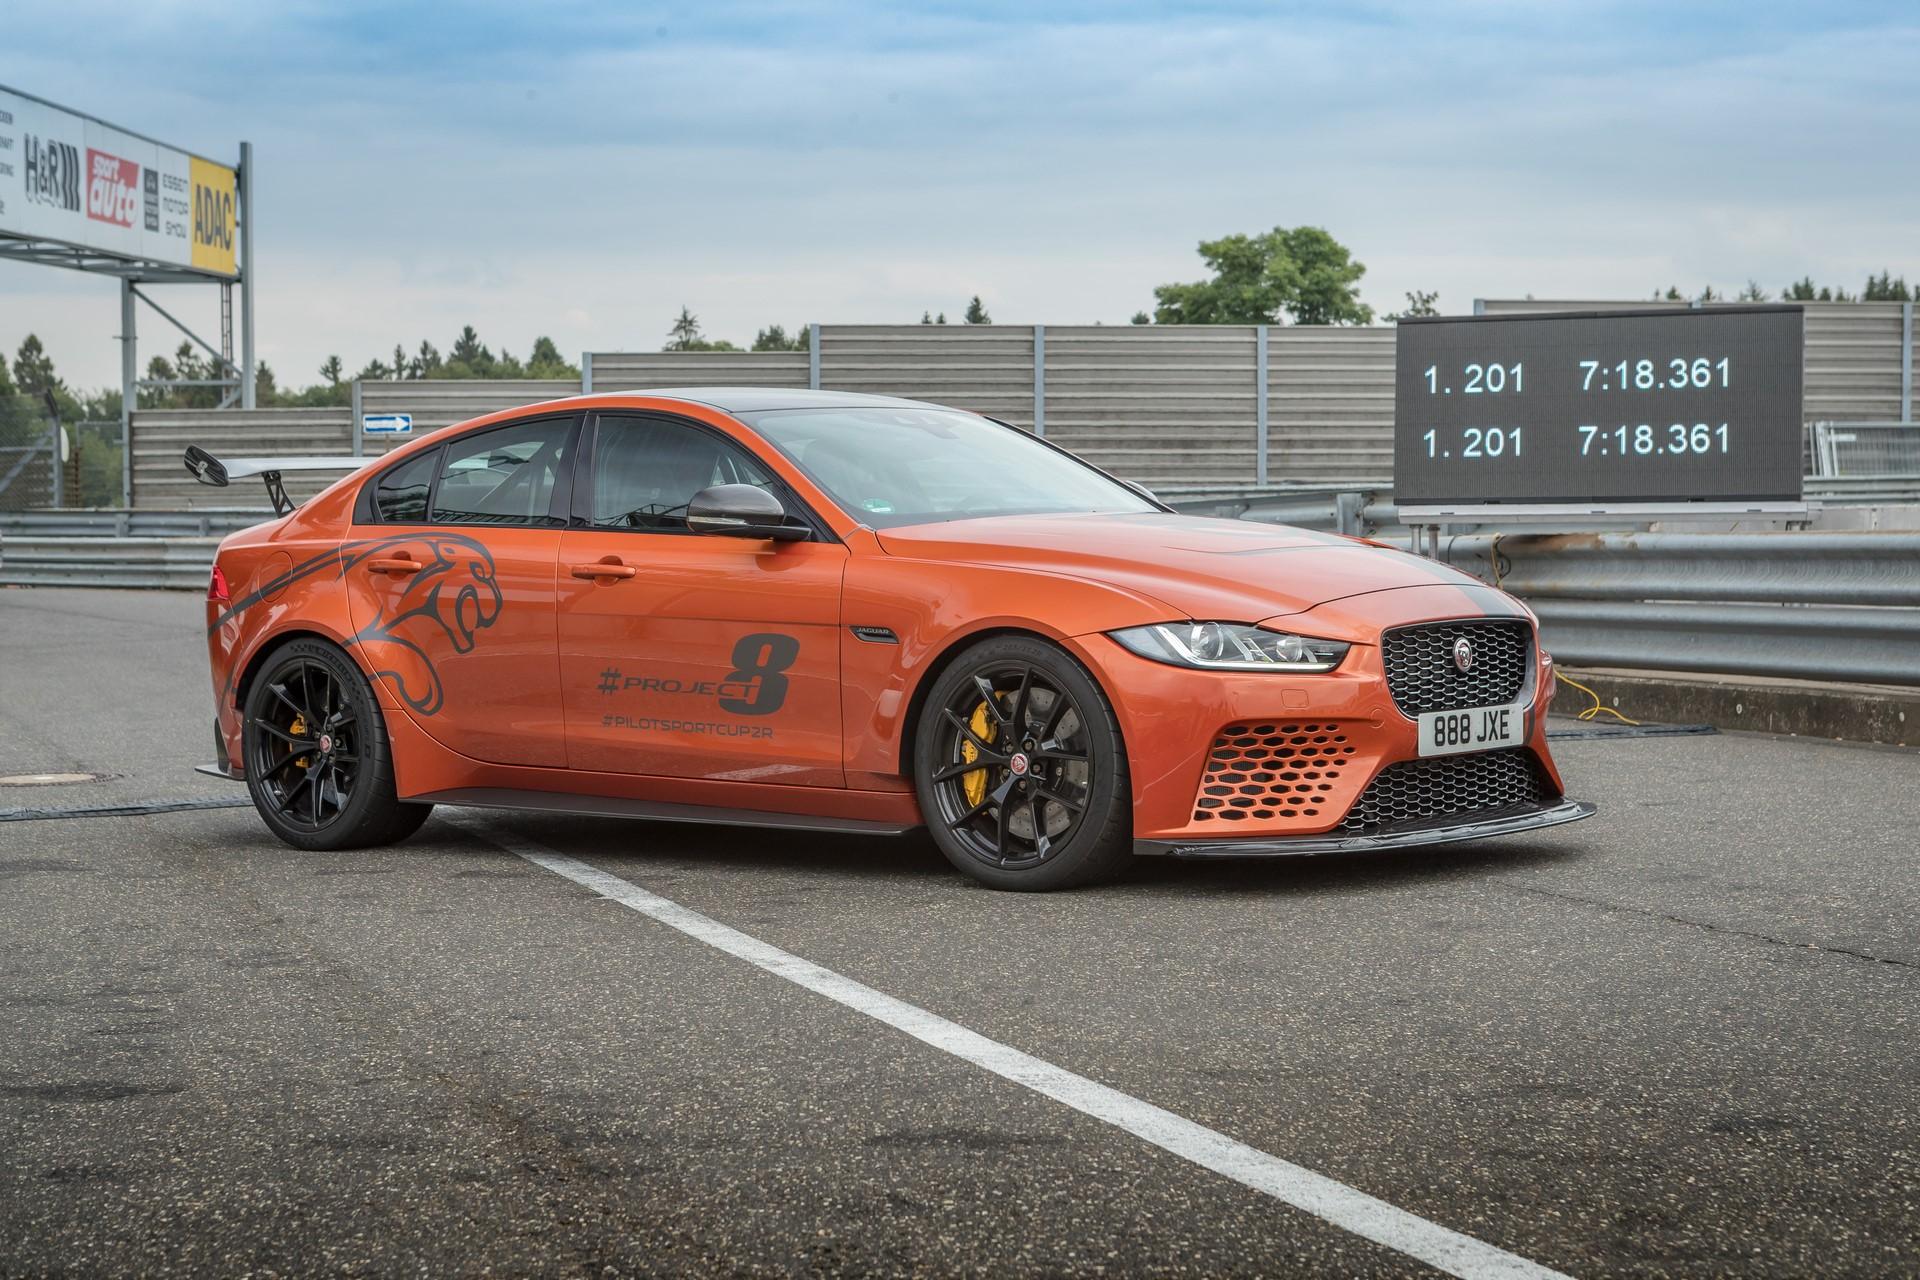 Jaguar-XE-SV-Project-8-new-Nurburgring-record-1